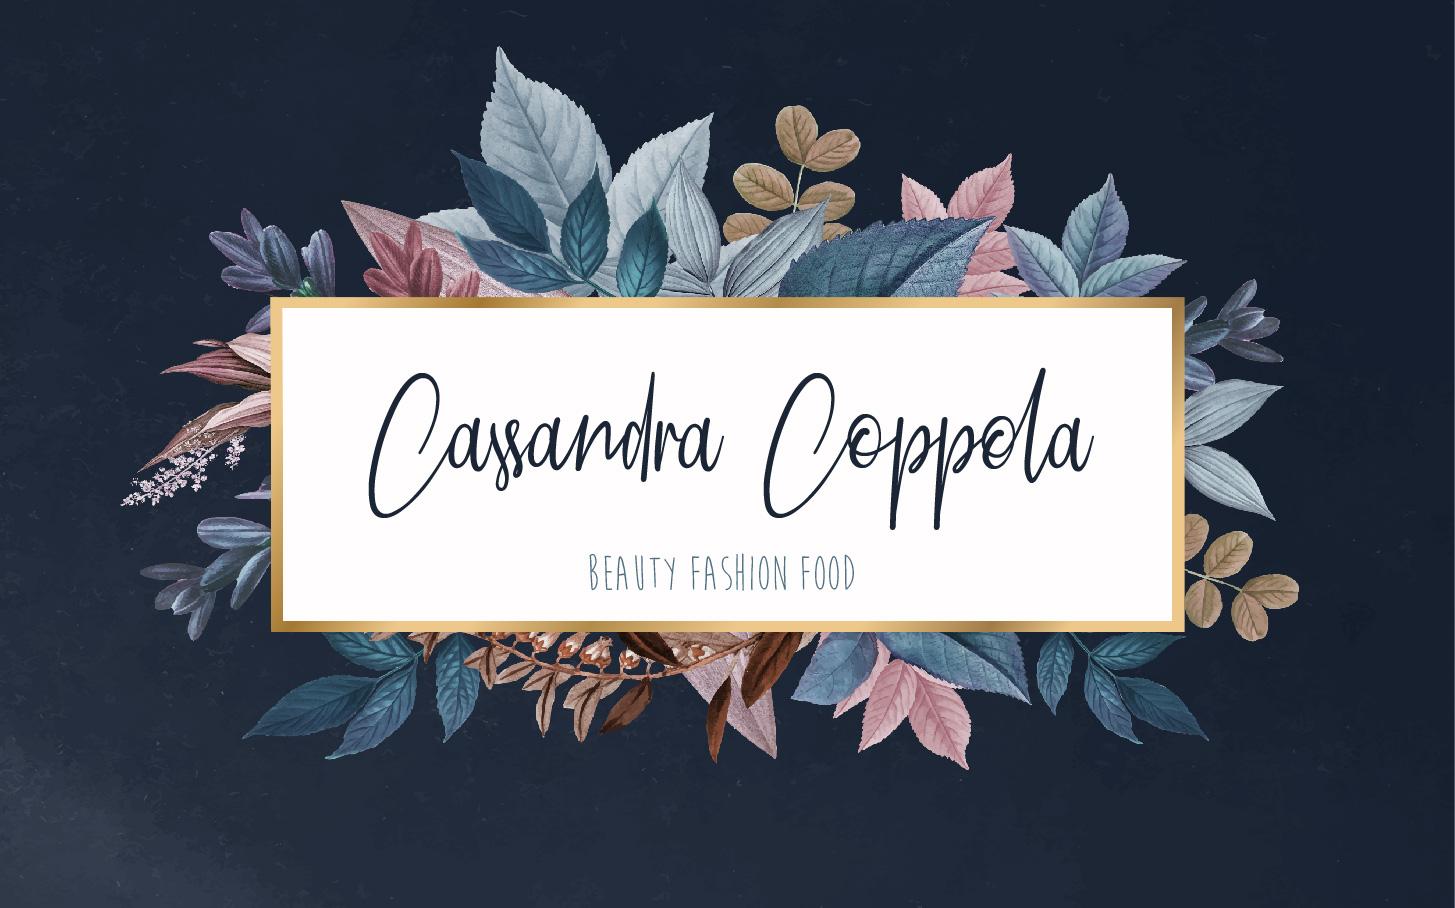 Cassandra Coppola